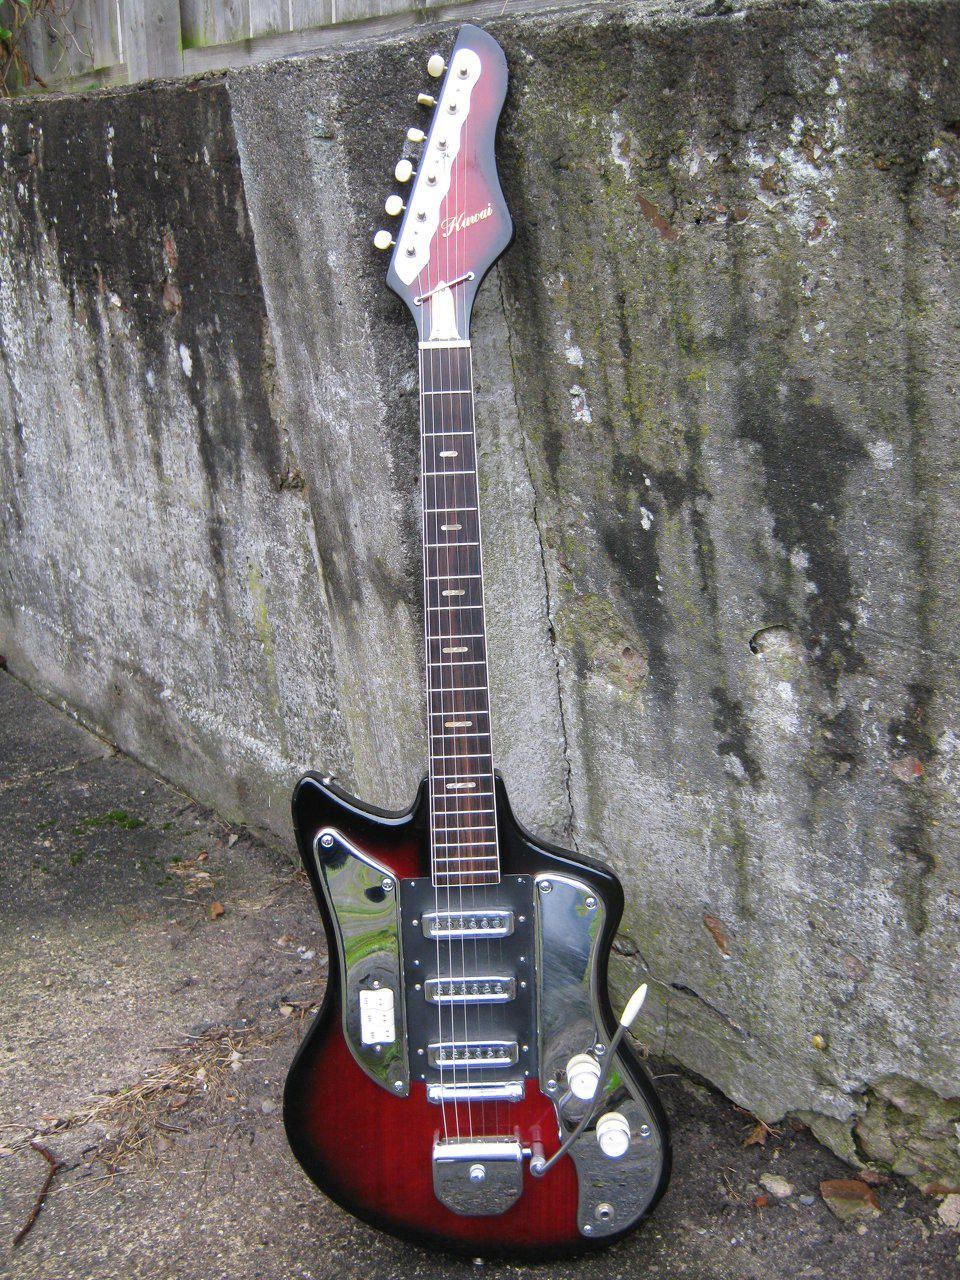 kawai s170 guitars in 2019 guitar collection vintage guitars guitar. Black Bedroom Furniture Sets. Home Design Ideas